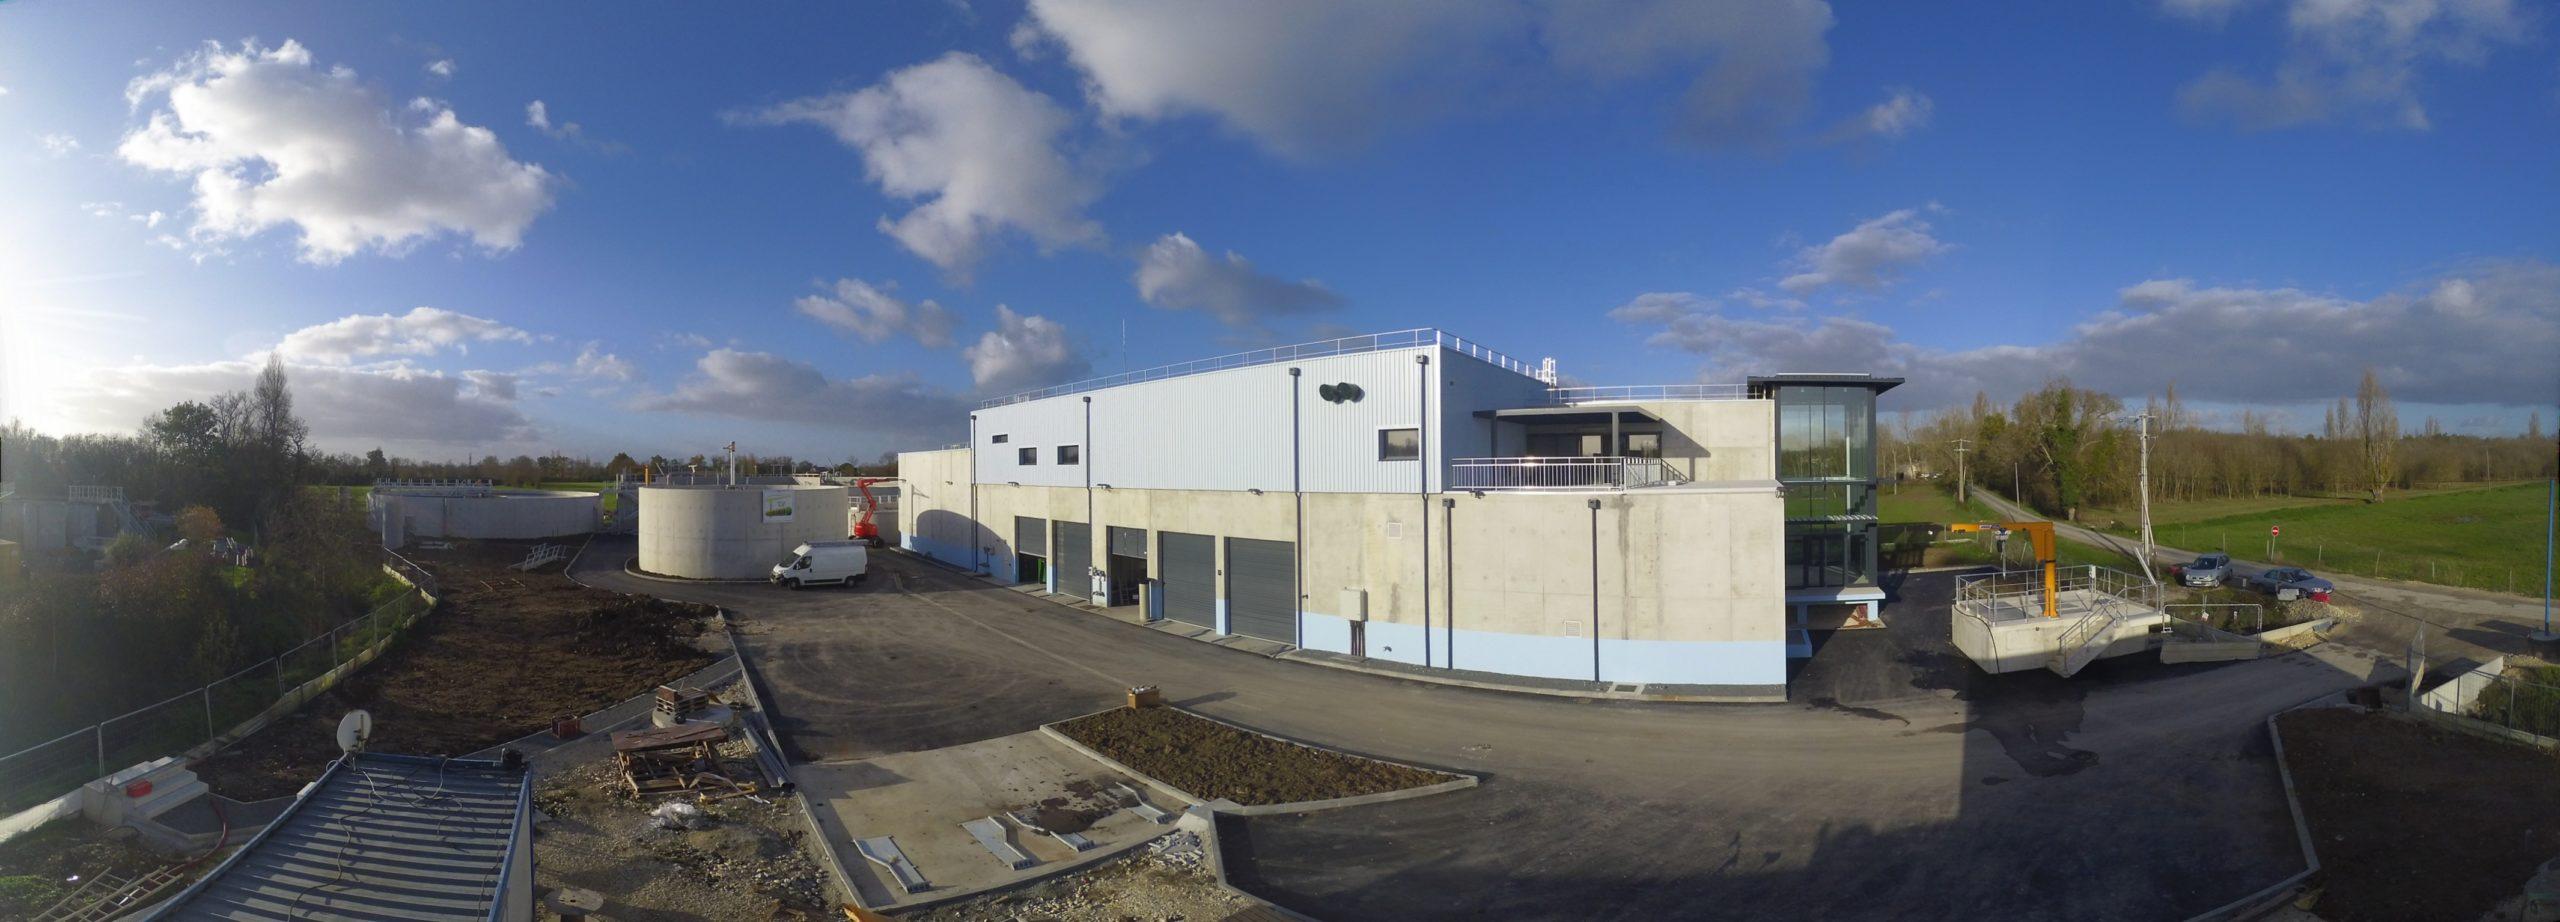 Gironde : bientôt la fin du chantier de la Step de Porto